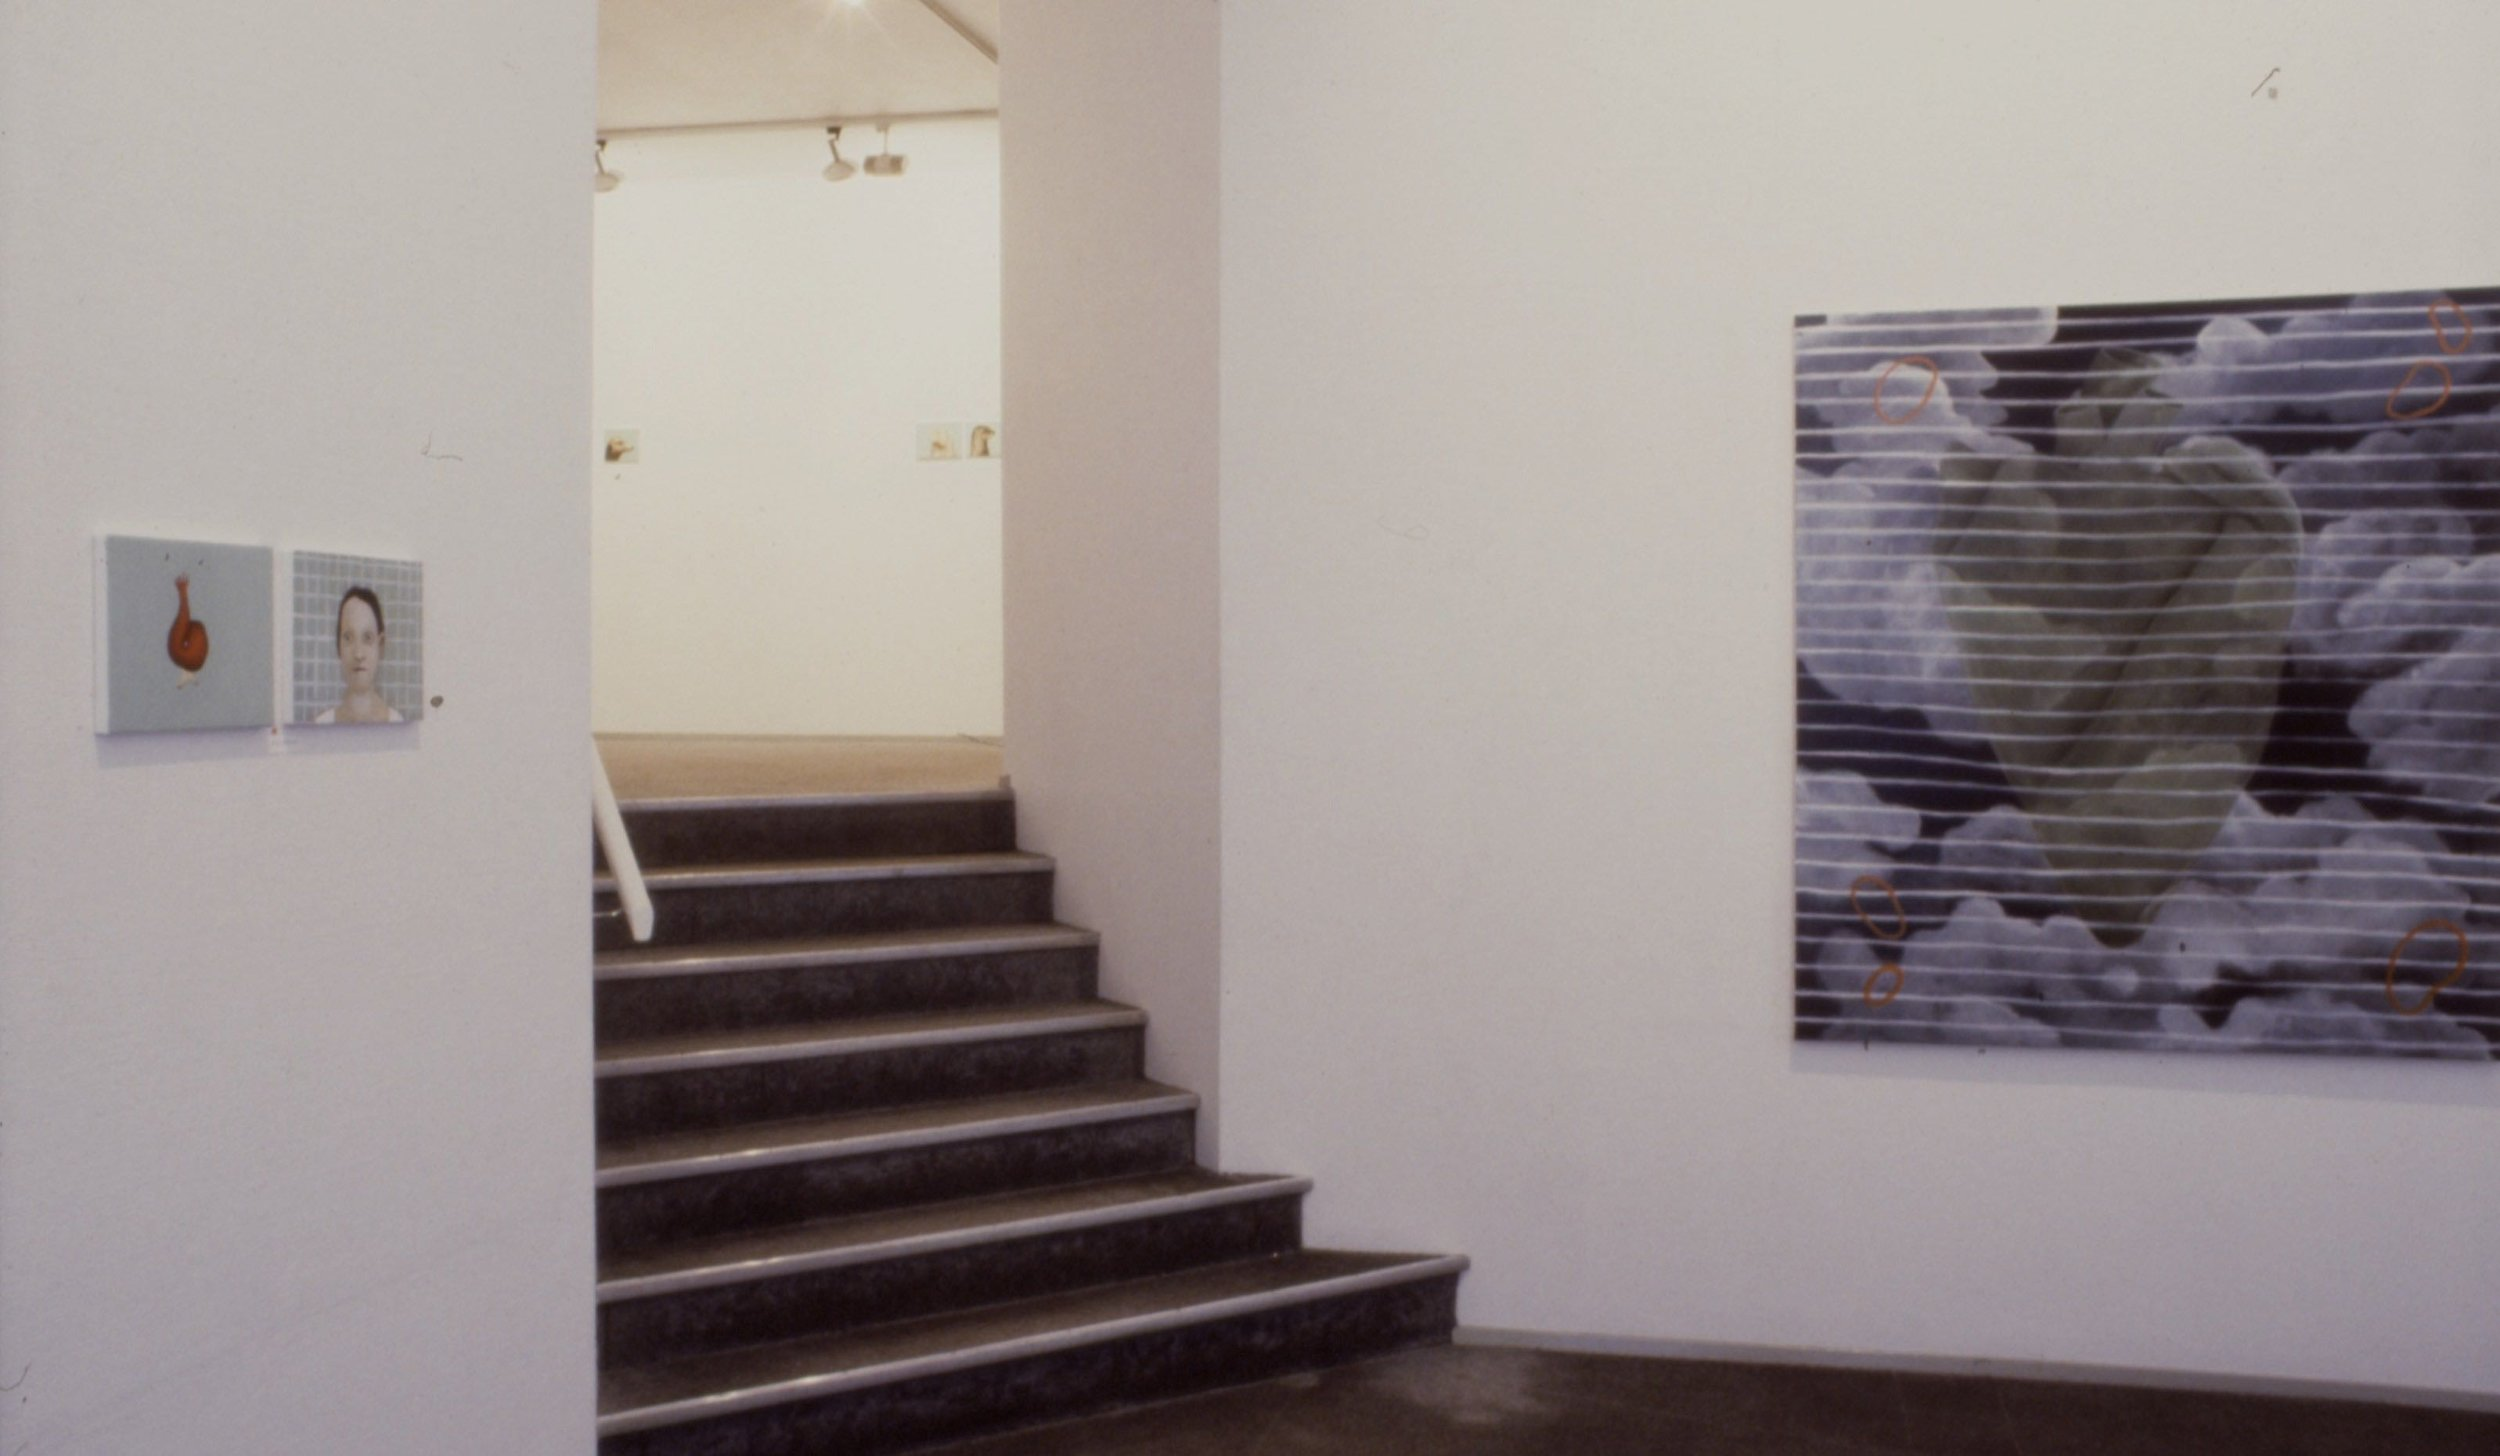 fra utstillingen   Antropomorf      galleri heer 1996